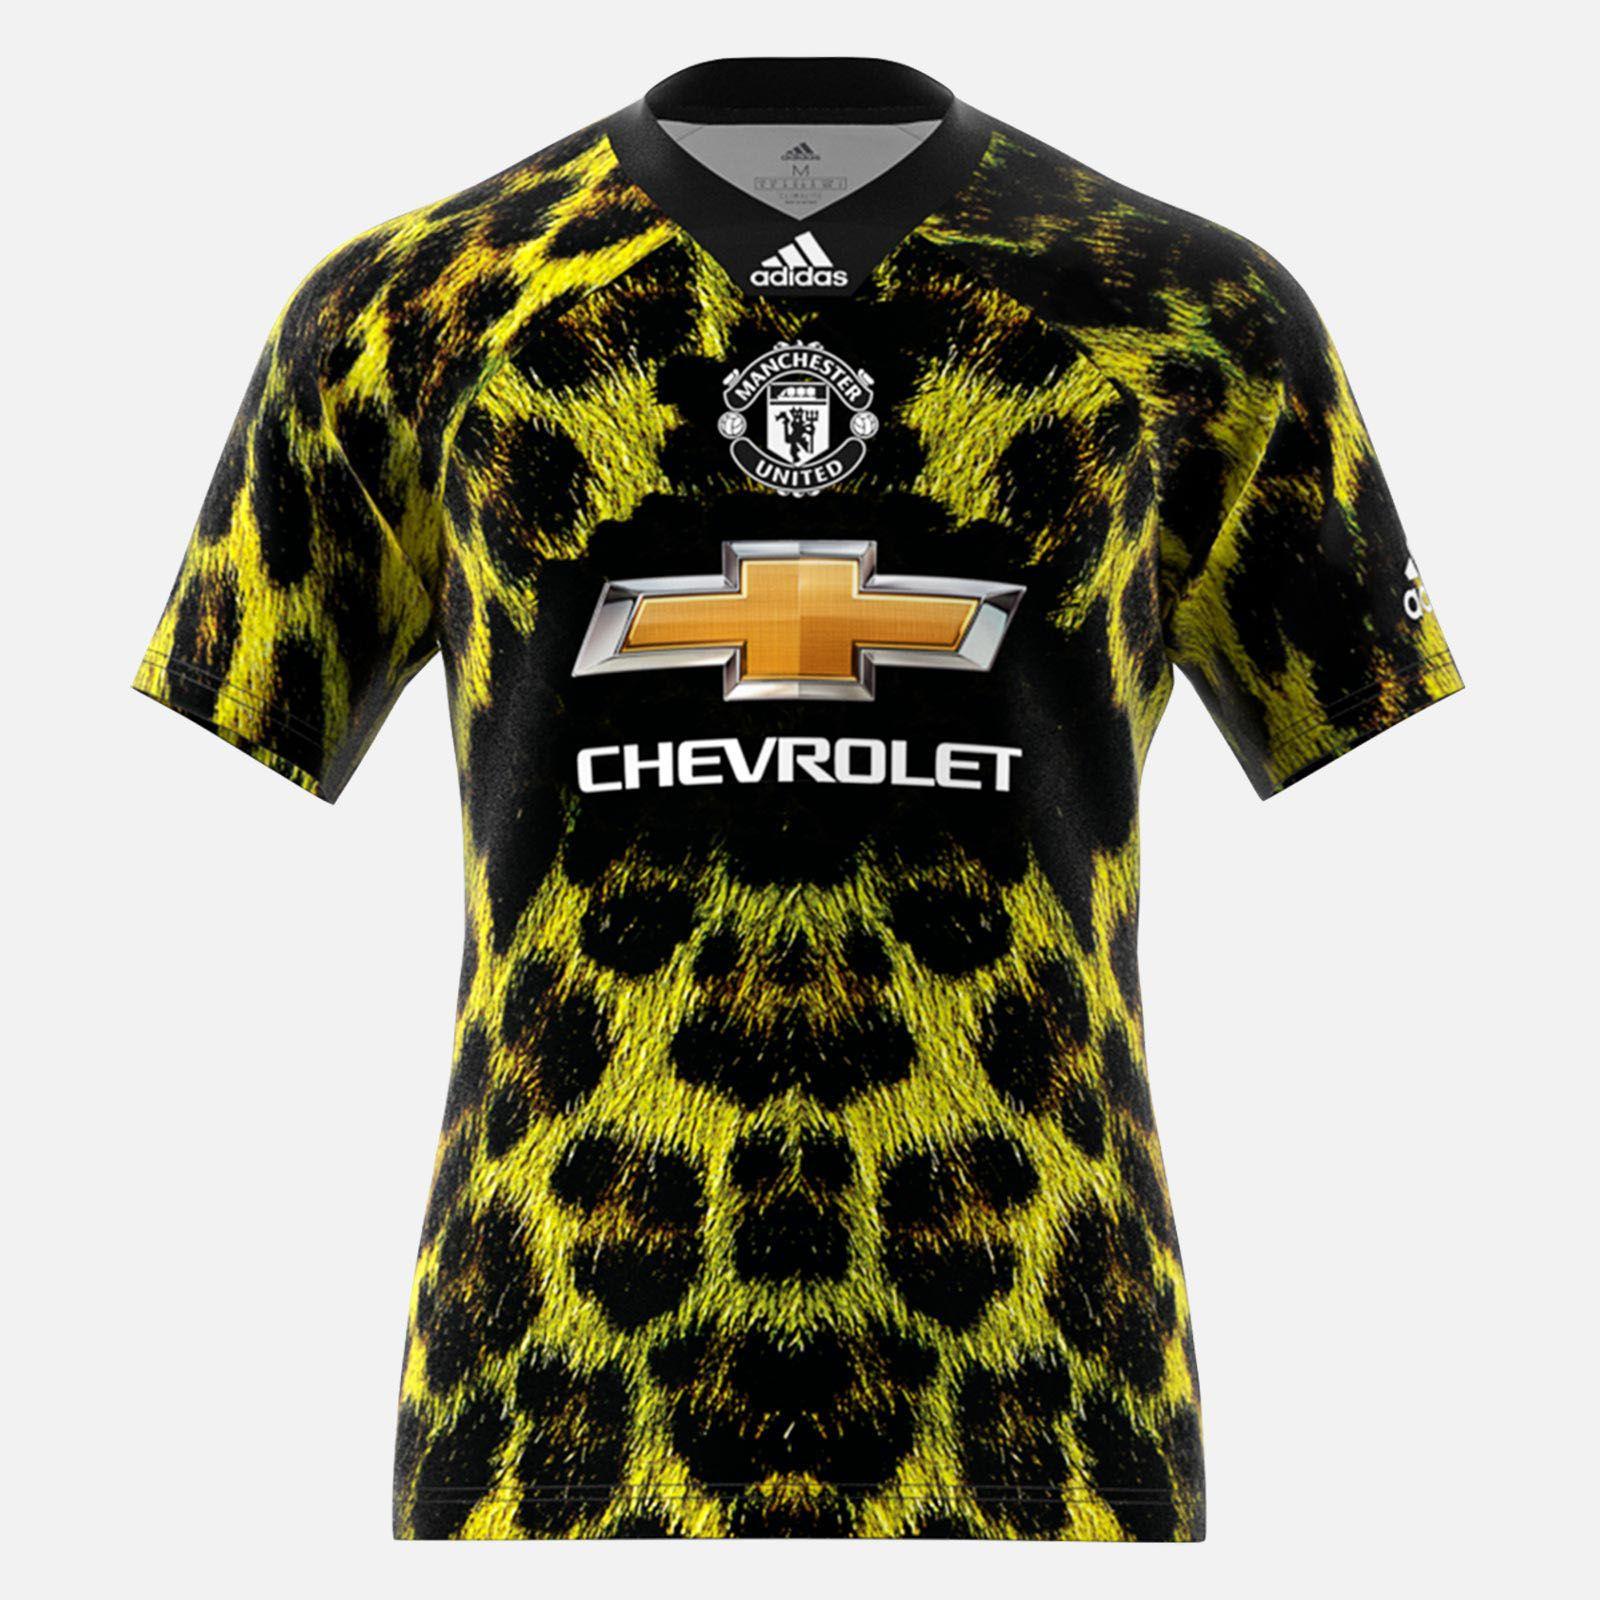 18-19 Manchester United EA Sports Green Jersey Shirt, Manchester ...